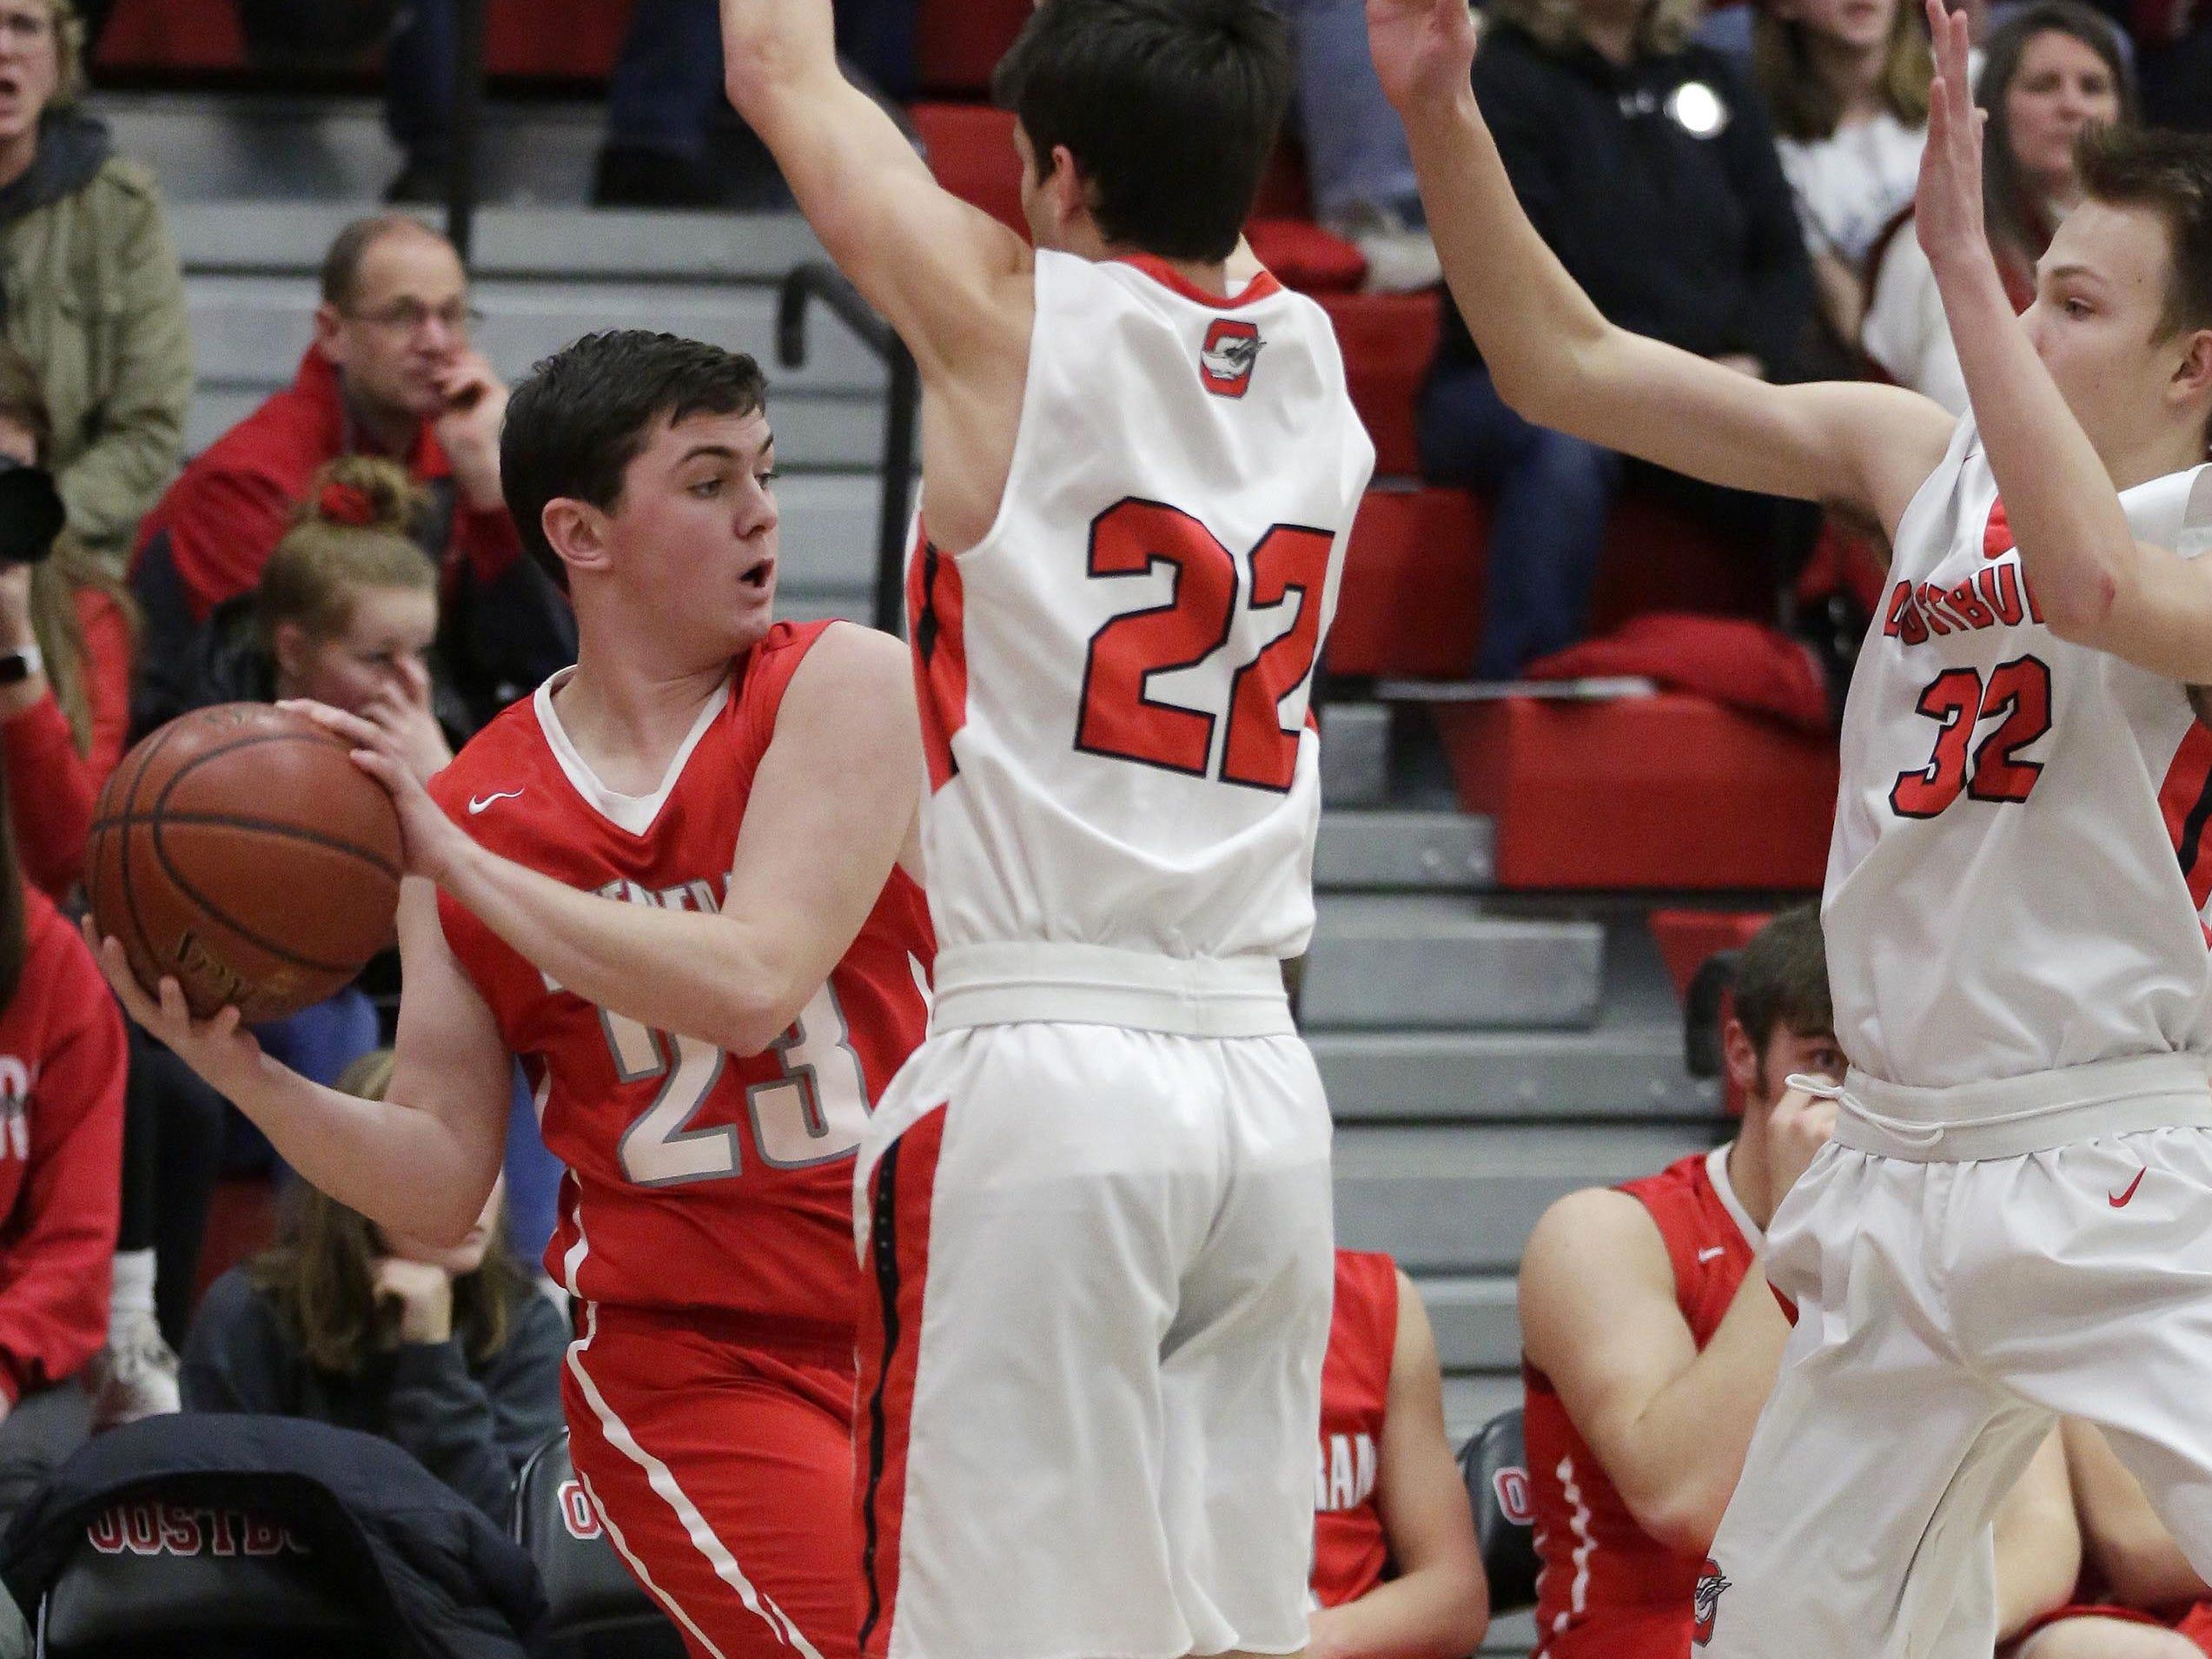 Manitowoc Lutheran's Josh Diel (23) looks to pass the ball beyond Oostburg's Brady Wisse (23) and Josh Meerdink (32), Friday, February 8, 2019, in Oostburg, Wis. Gary C. Klein/USA TODAY NETWORK-Wisconsin